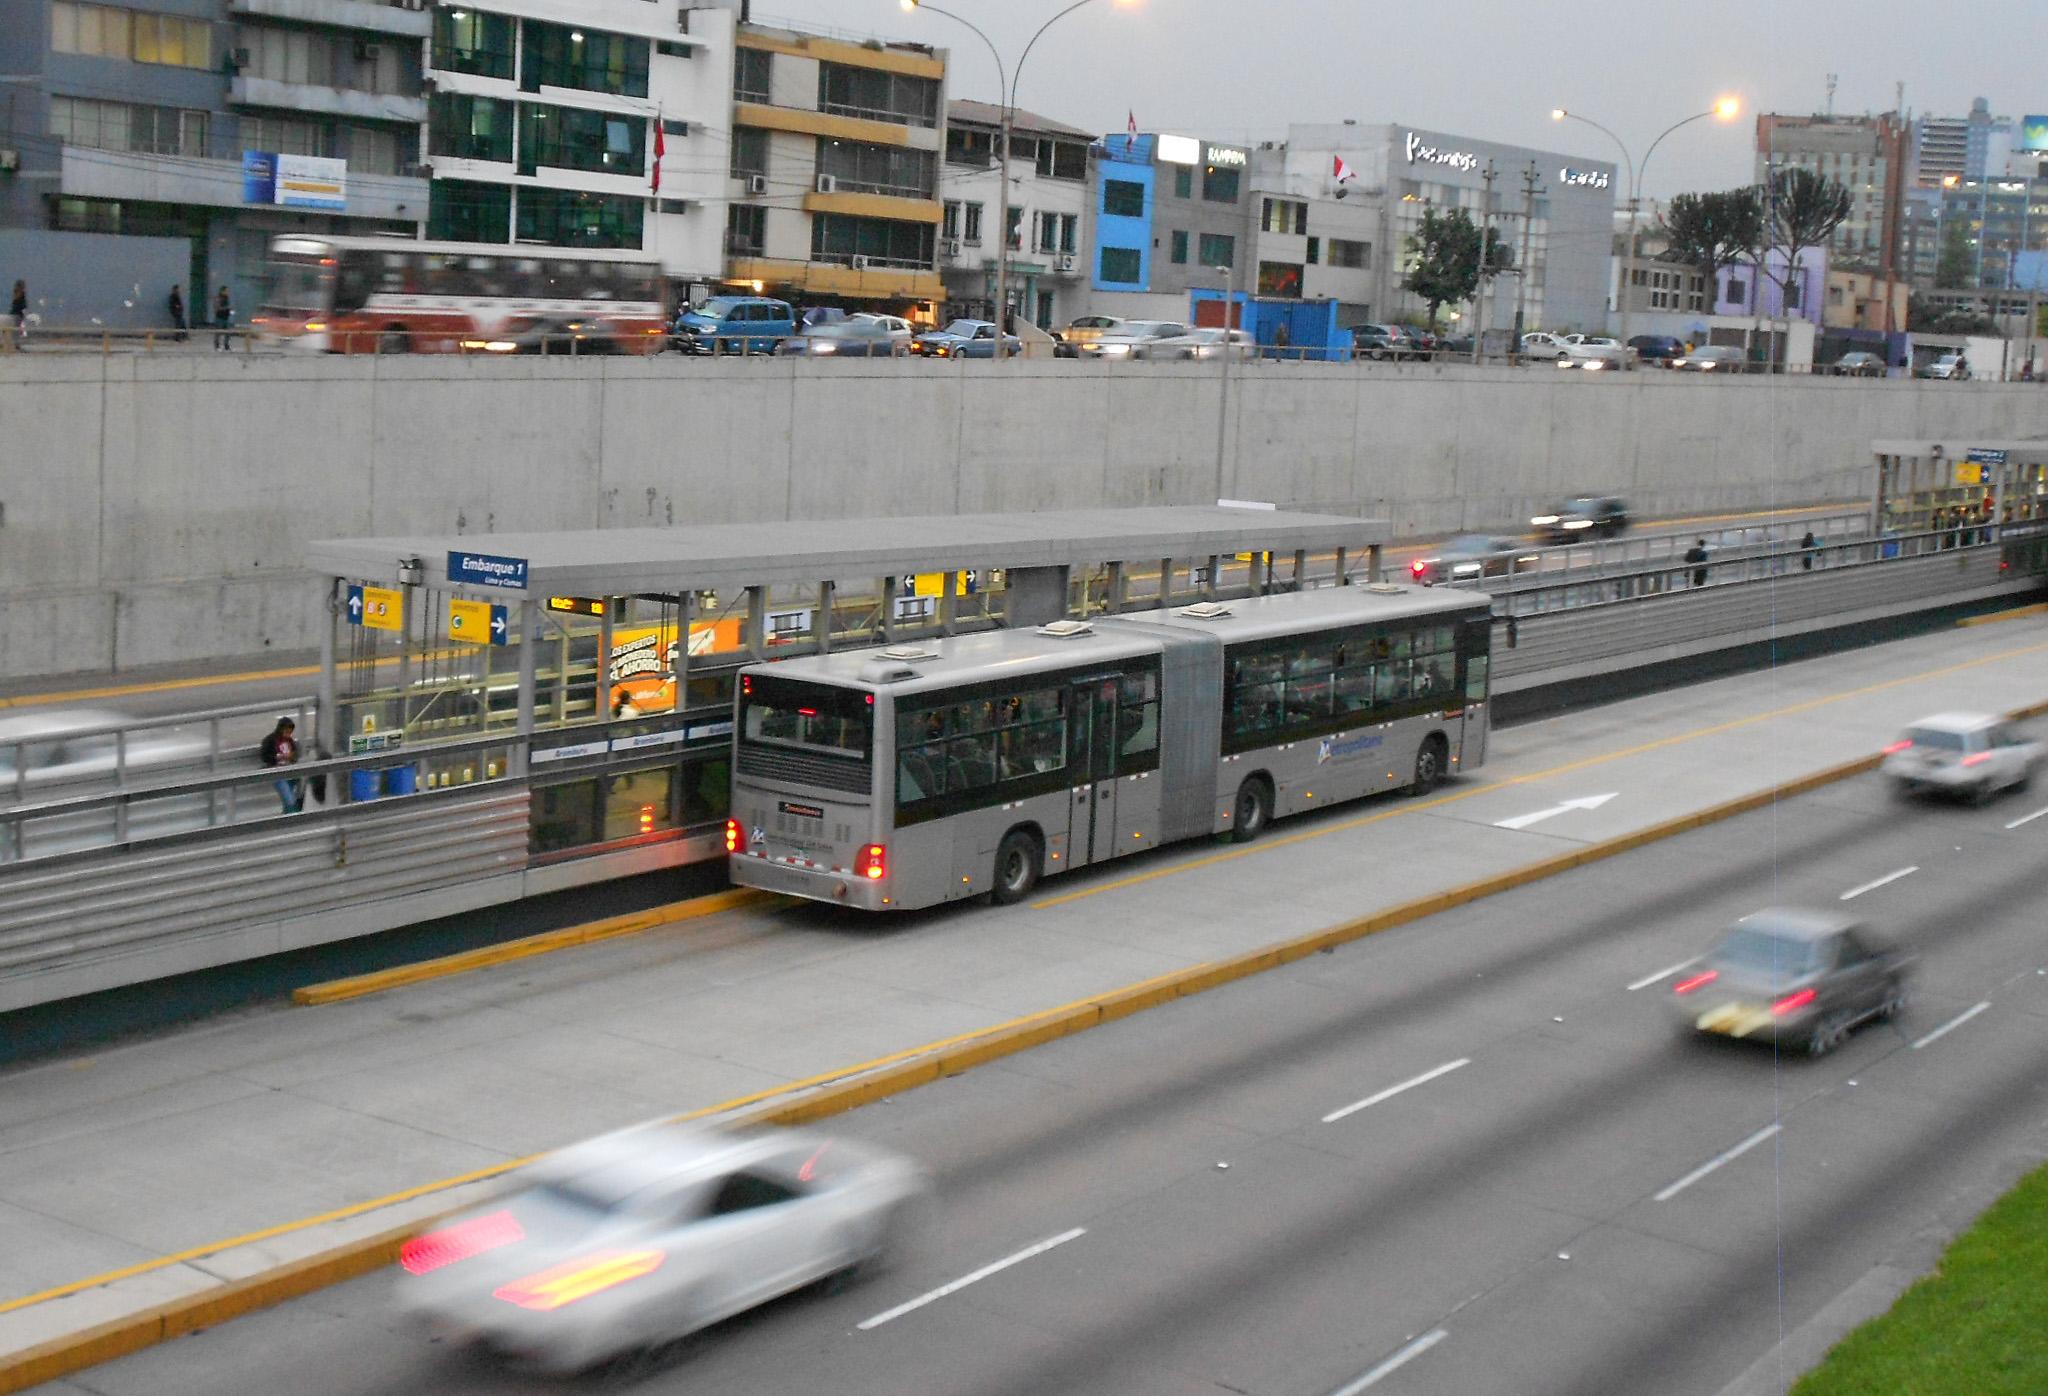 Le Metropolitano, BHNS de Lima (Pérou), mis en service en 2010